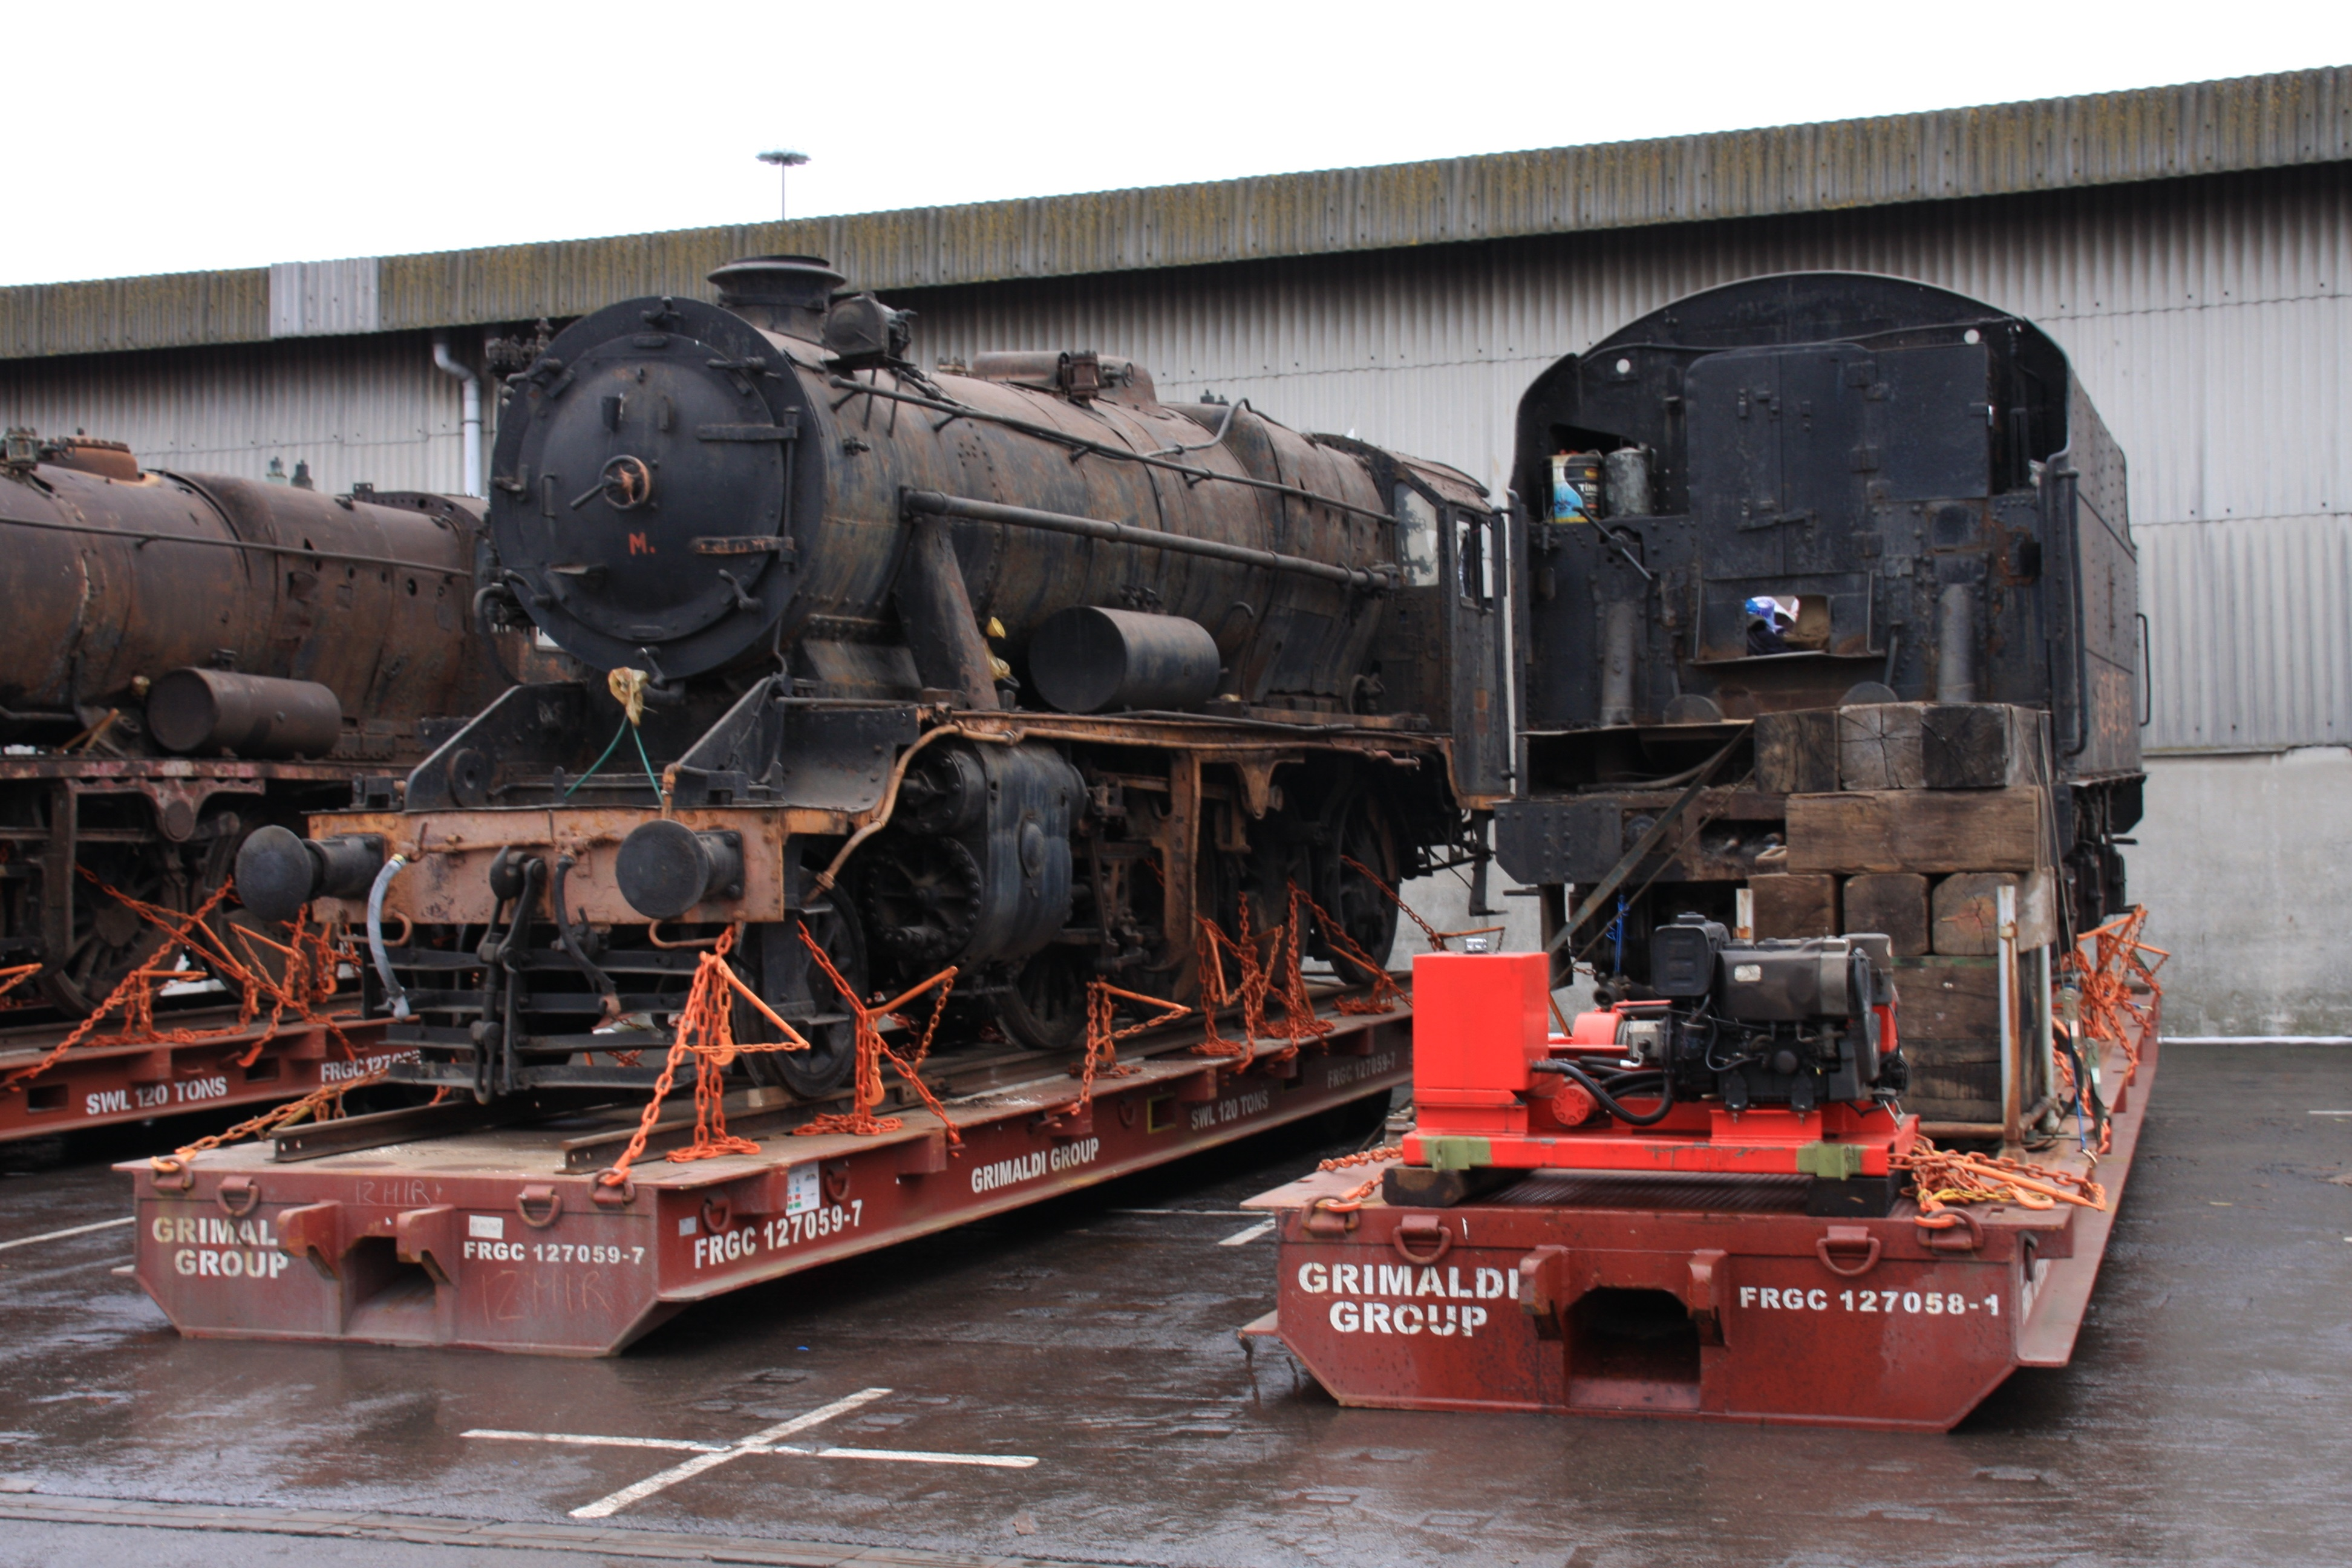 45170 at Portbury Dock. Photo provided by The Bristol Port Company.